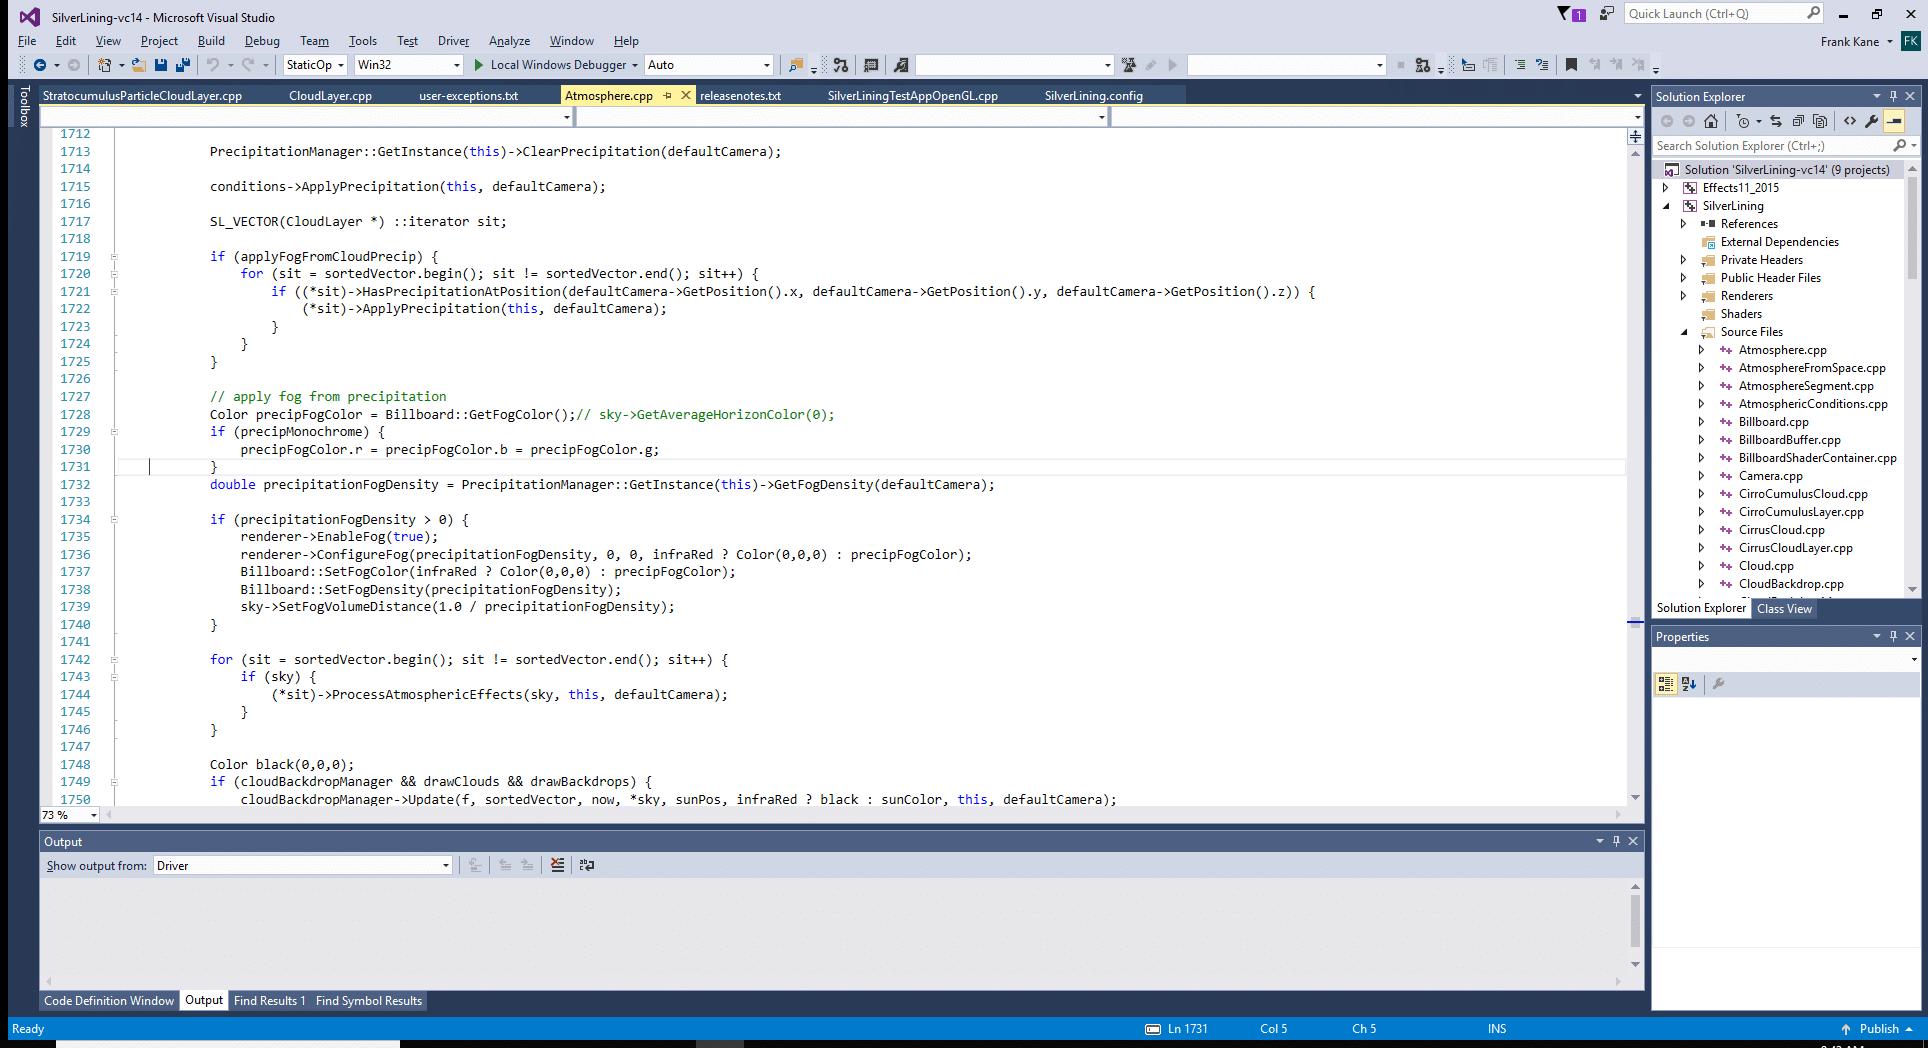 SilverLining code